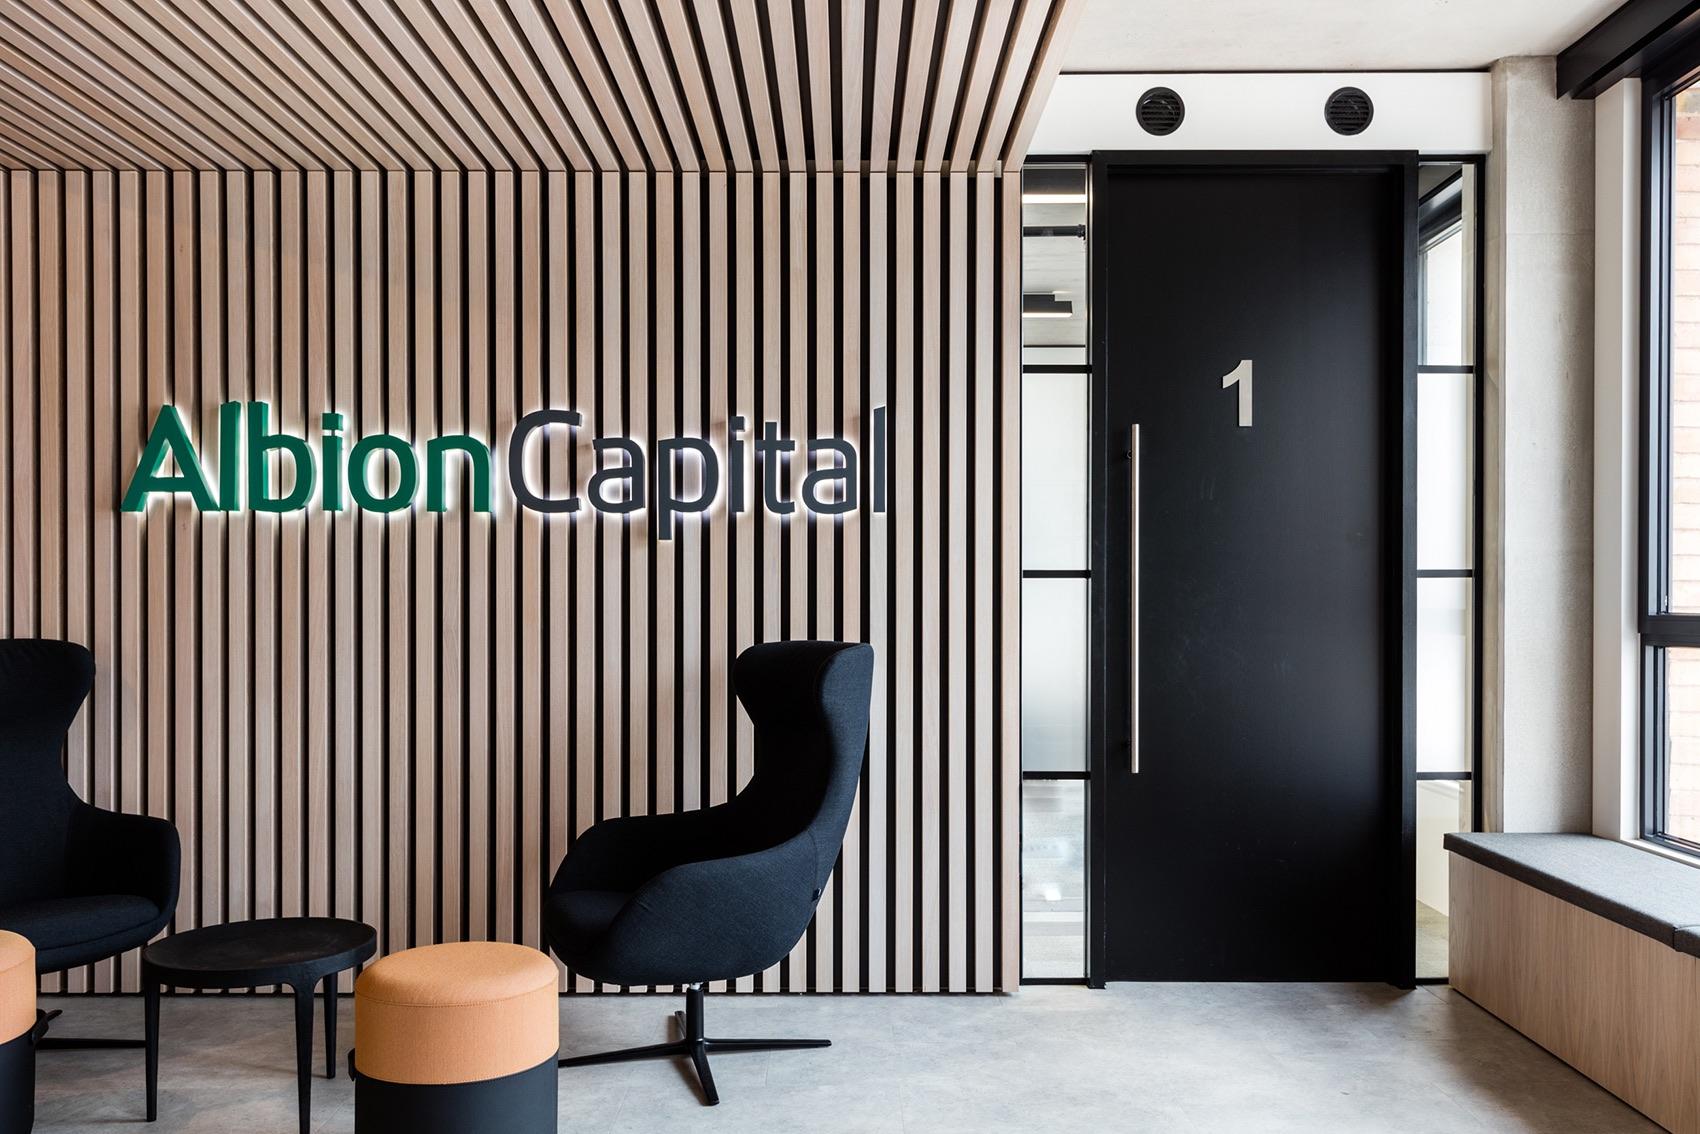 albion-capital-london-office-3